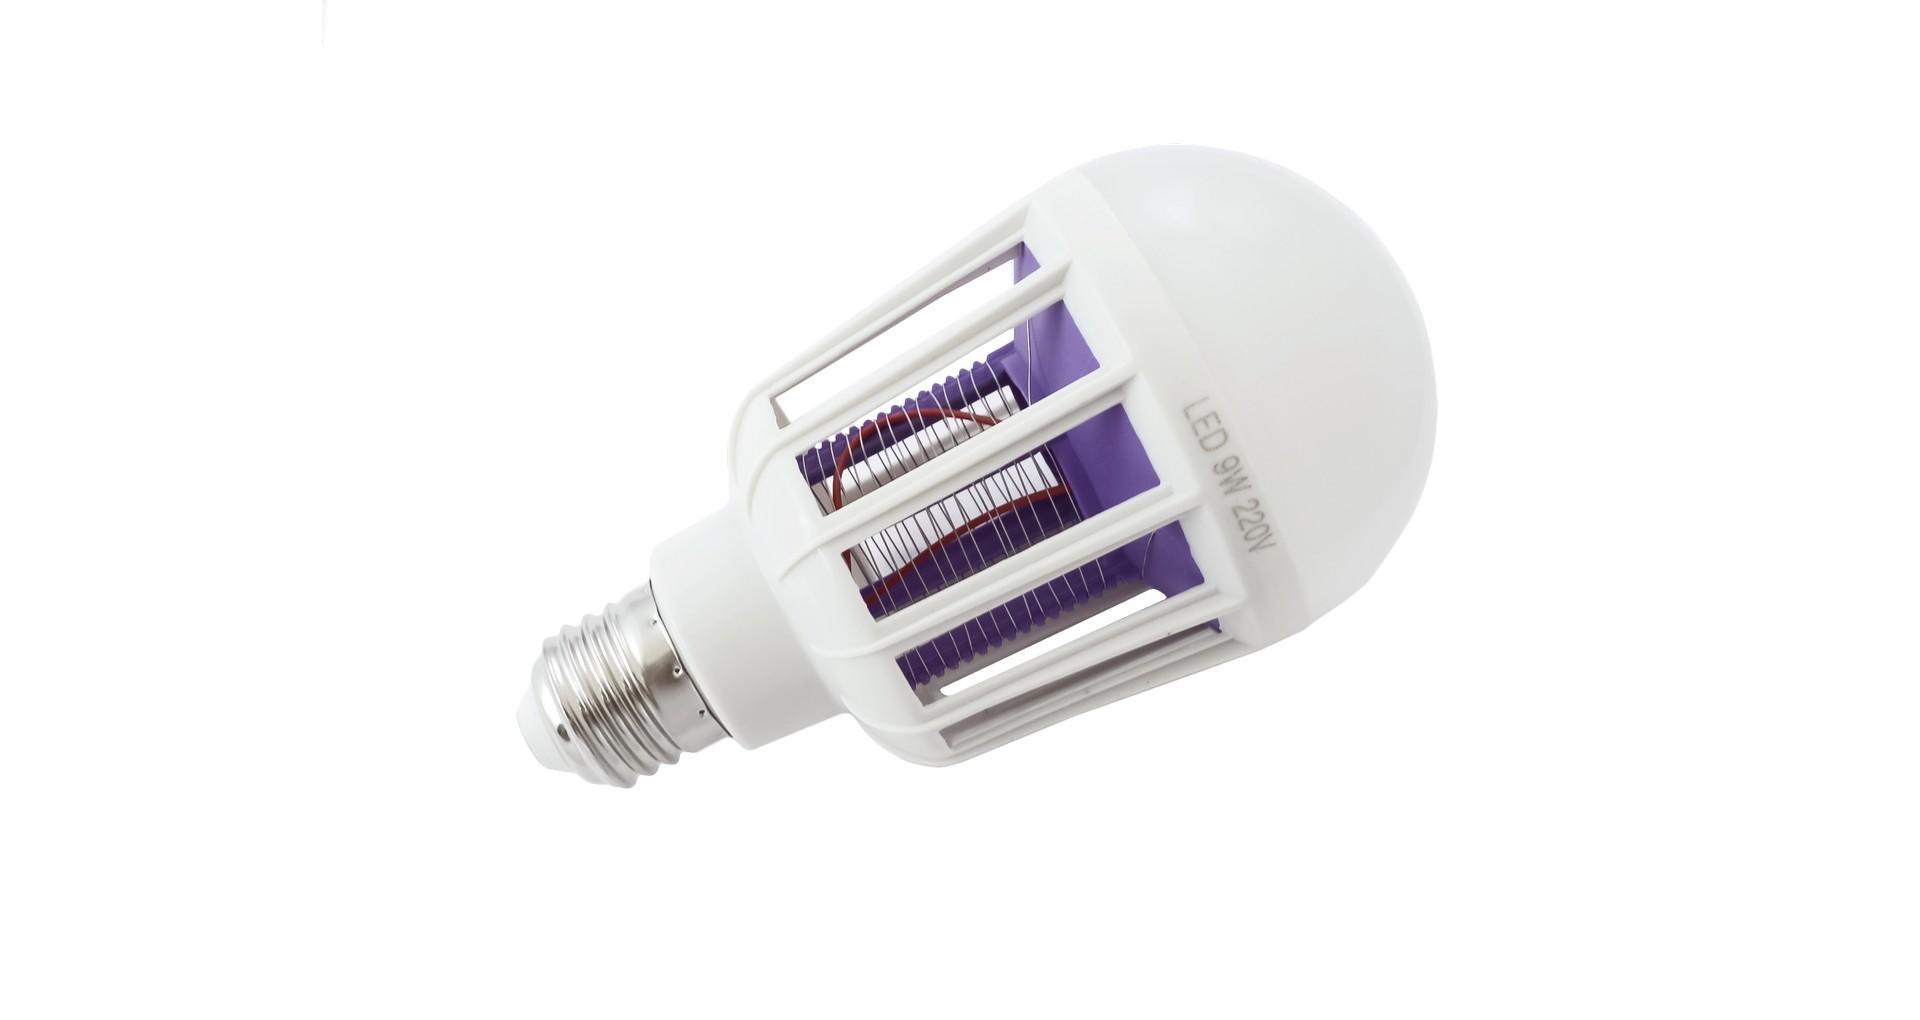 Лампа антимоскитная Elite - 9 Вт 3